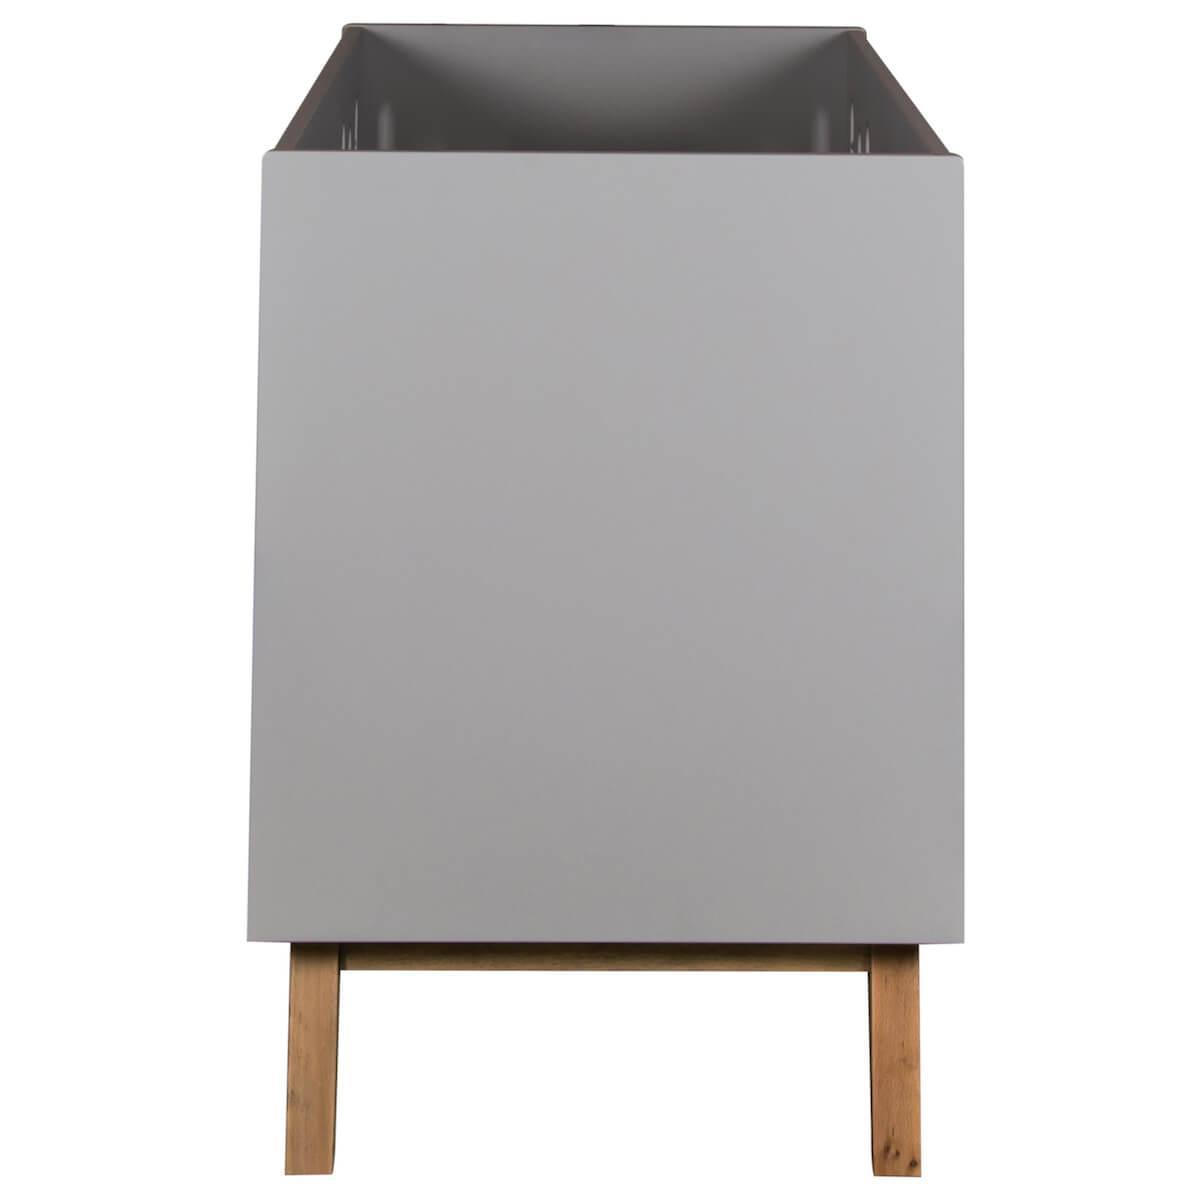 Cuna evolutiva 60x120cm TRENDY Quax griffin grey